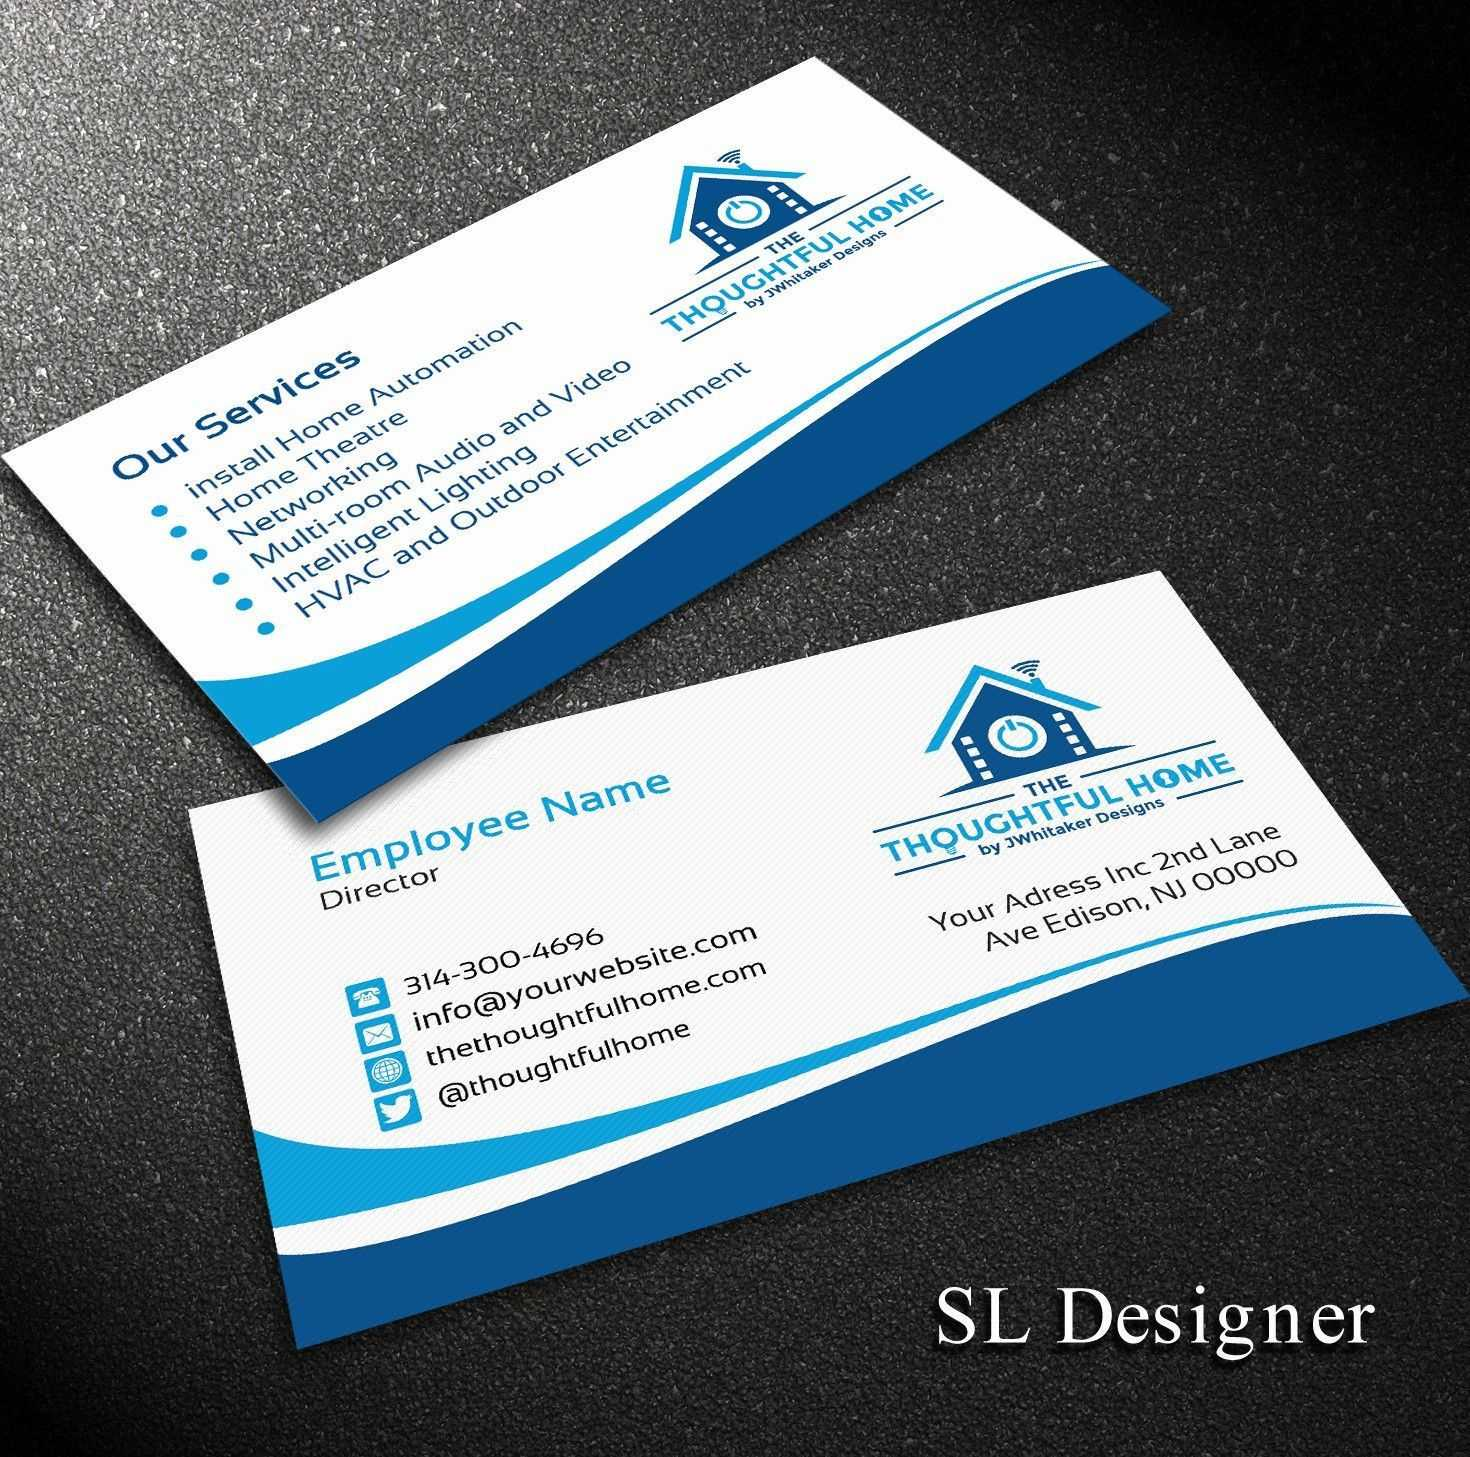 Pinanggunstore On Business Cards throughout Hvac Business Card Template